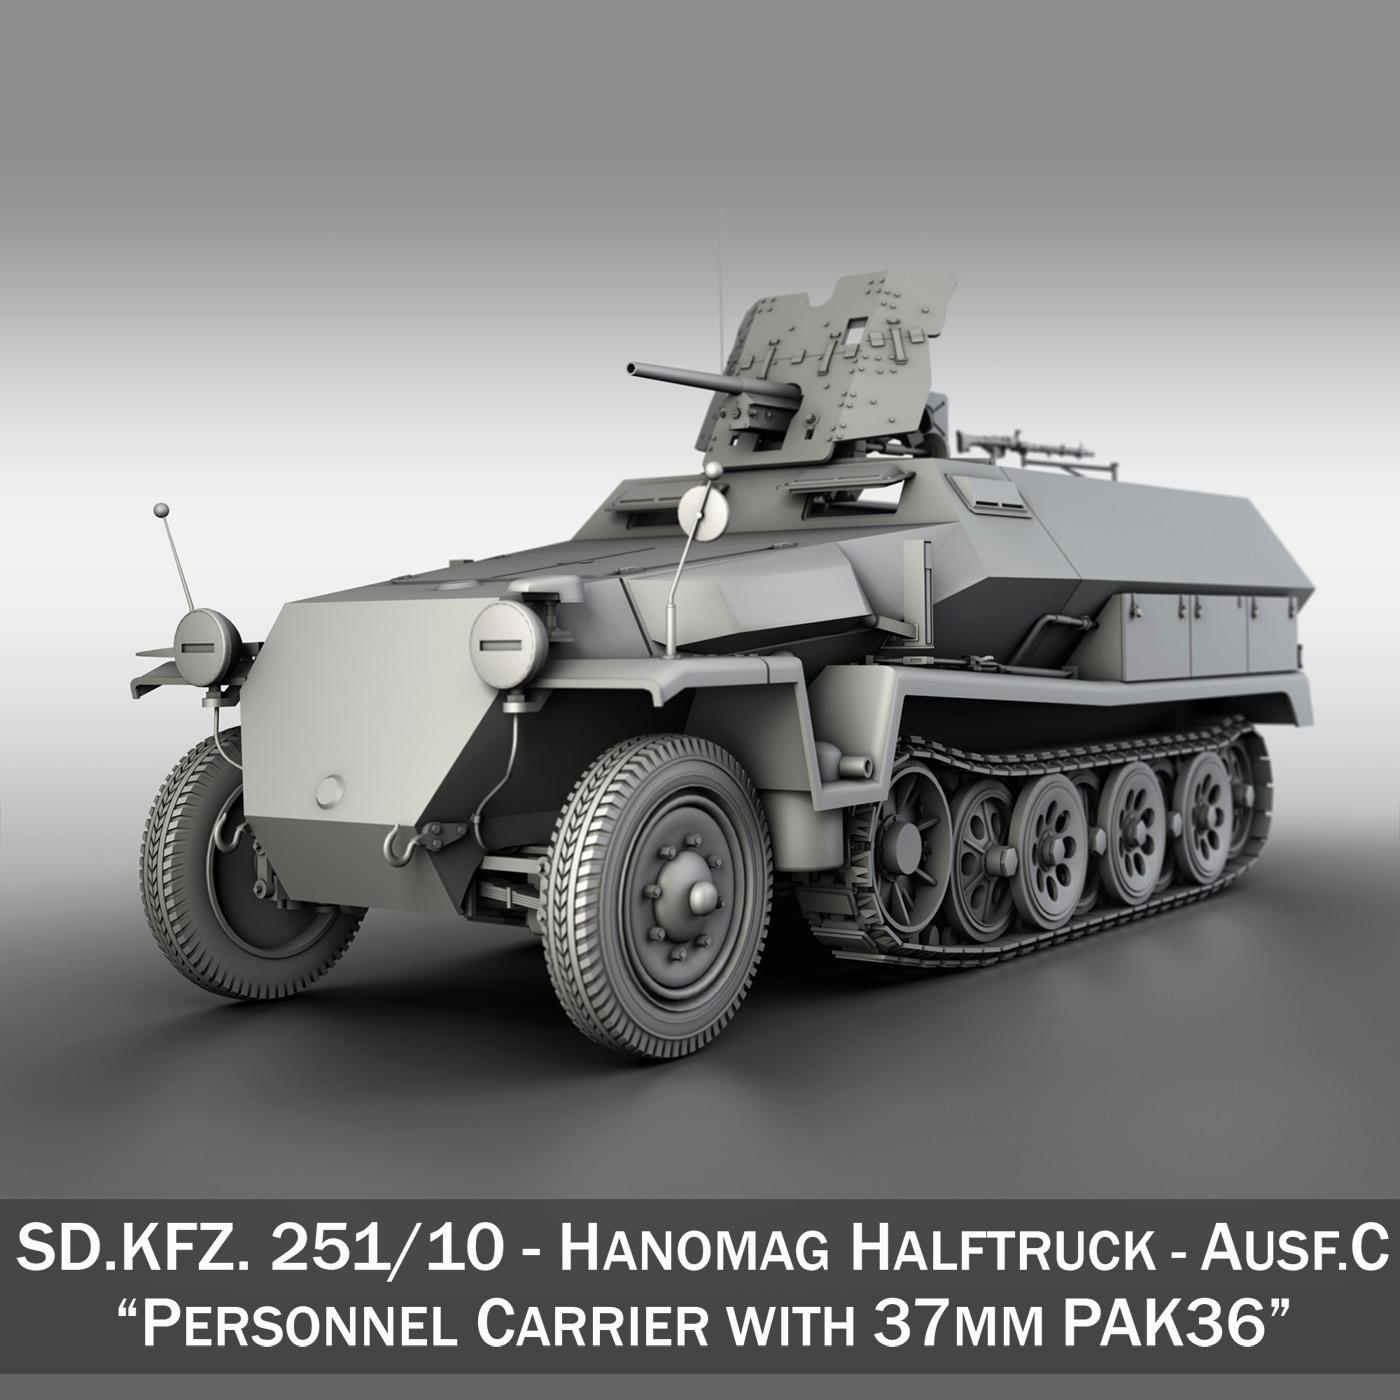 sdkfz 251 ausf.c – hanomag half-track 3d model 3ds fbx c4d lwo obj 251702